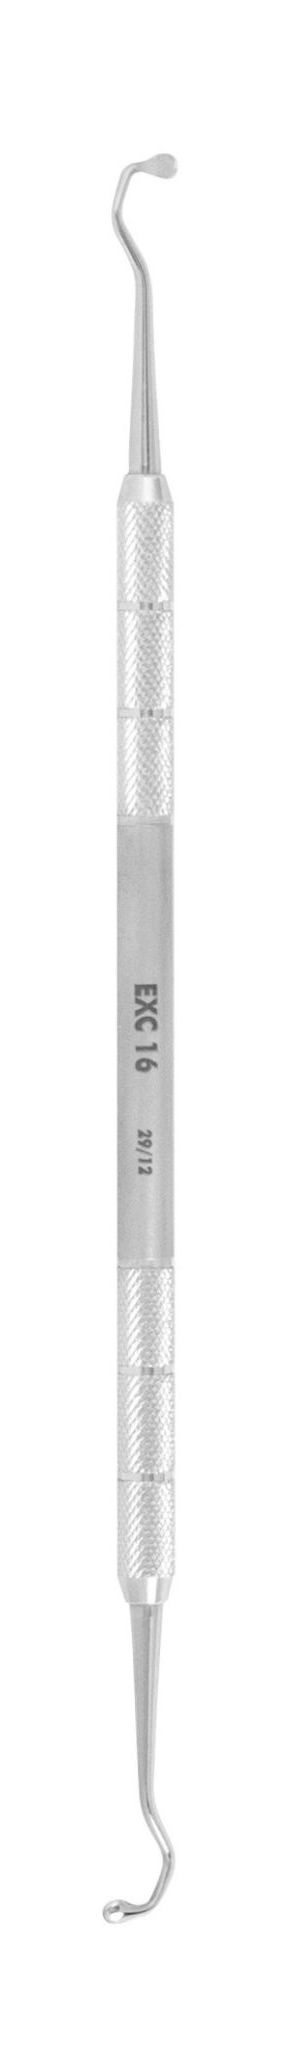 Exc 16